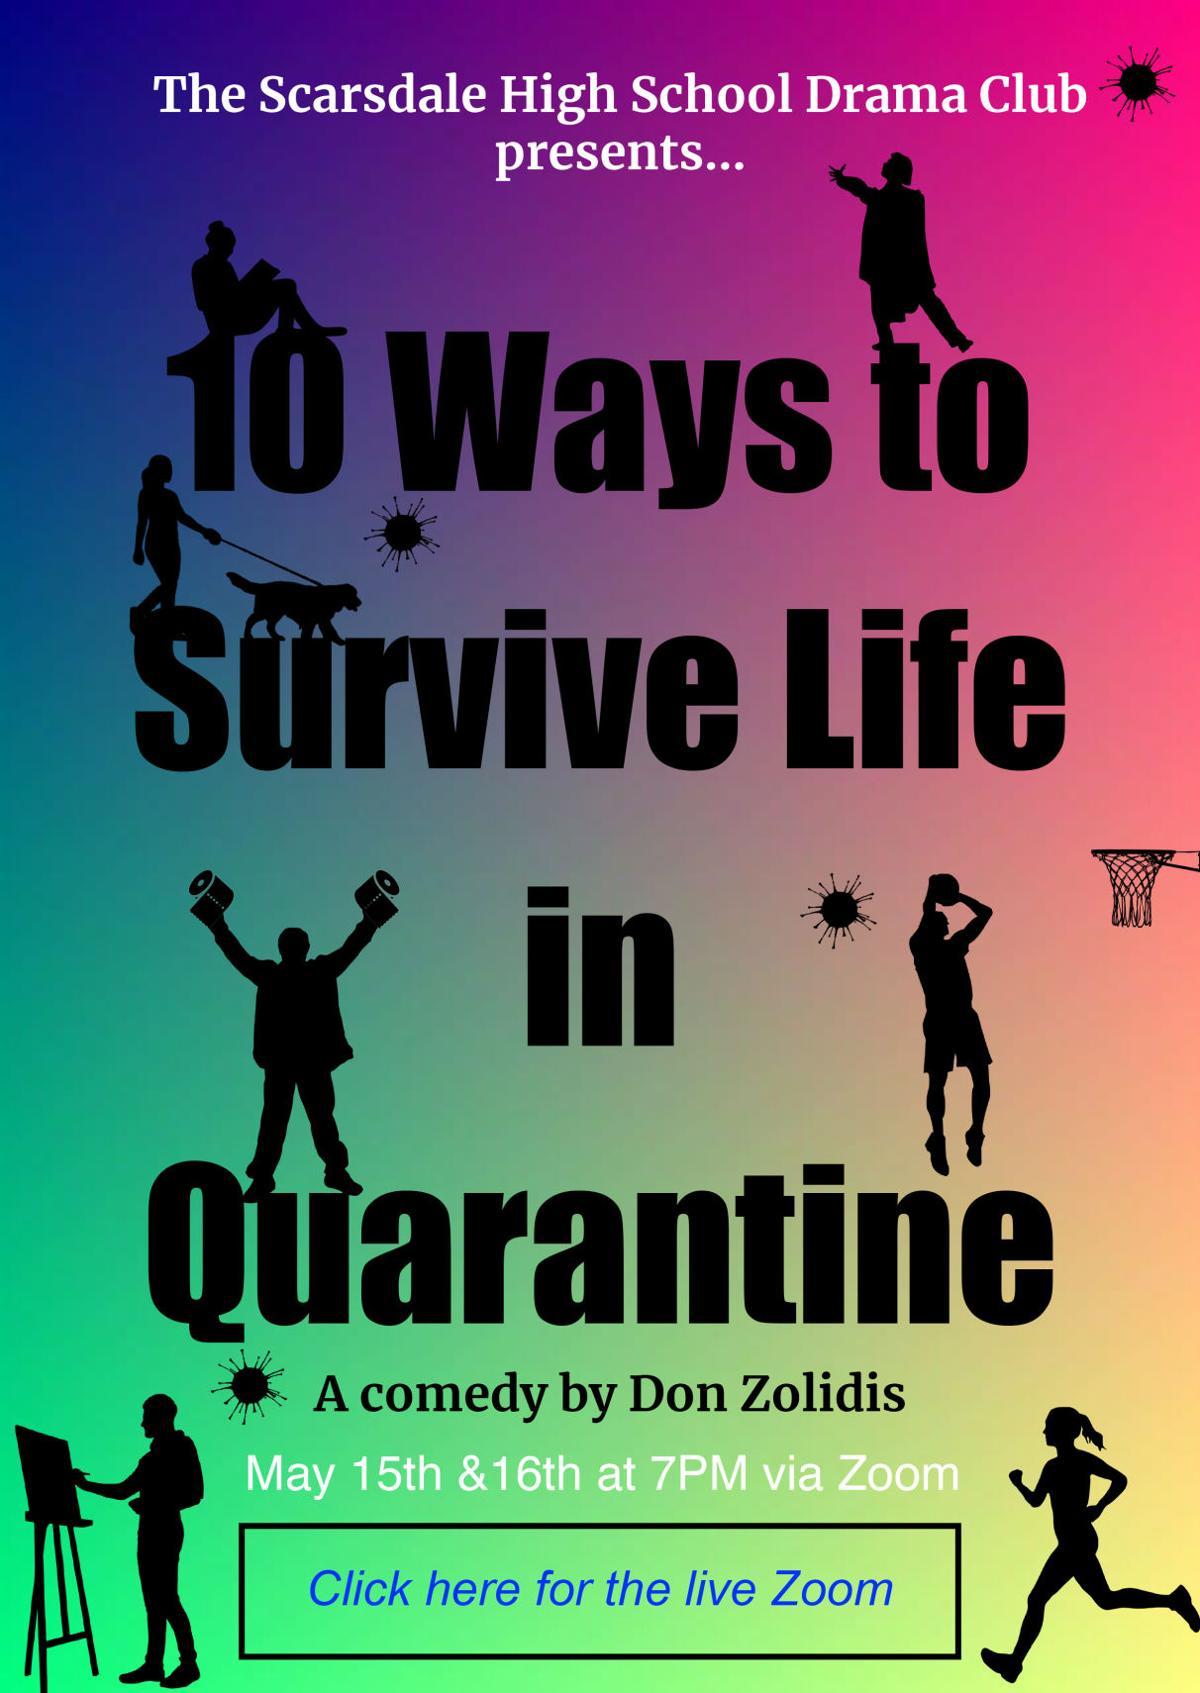 10 ways to survive life in quarantine poster version 2 (1).jpg